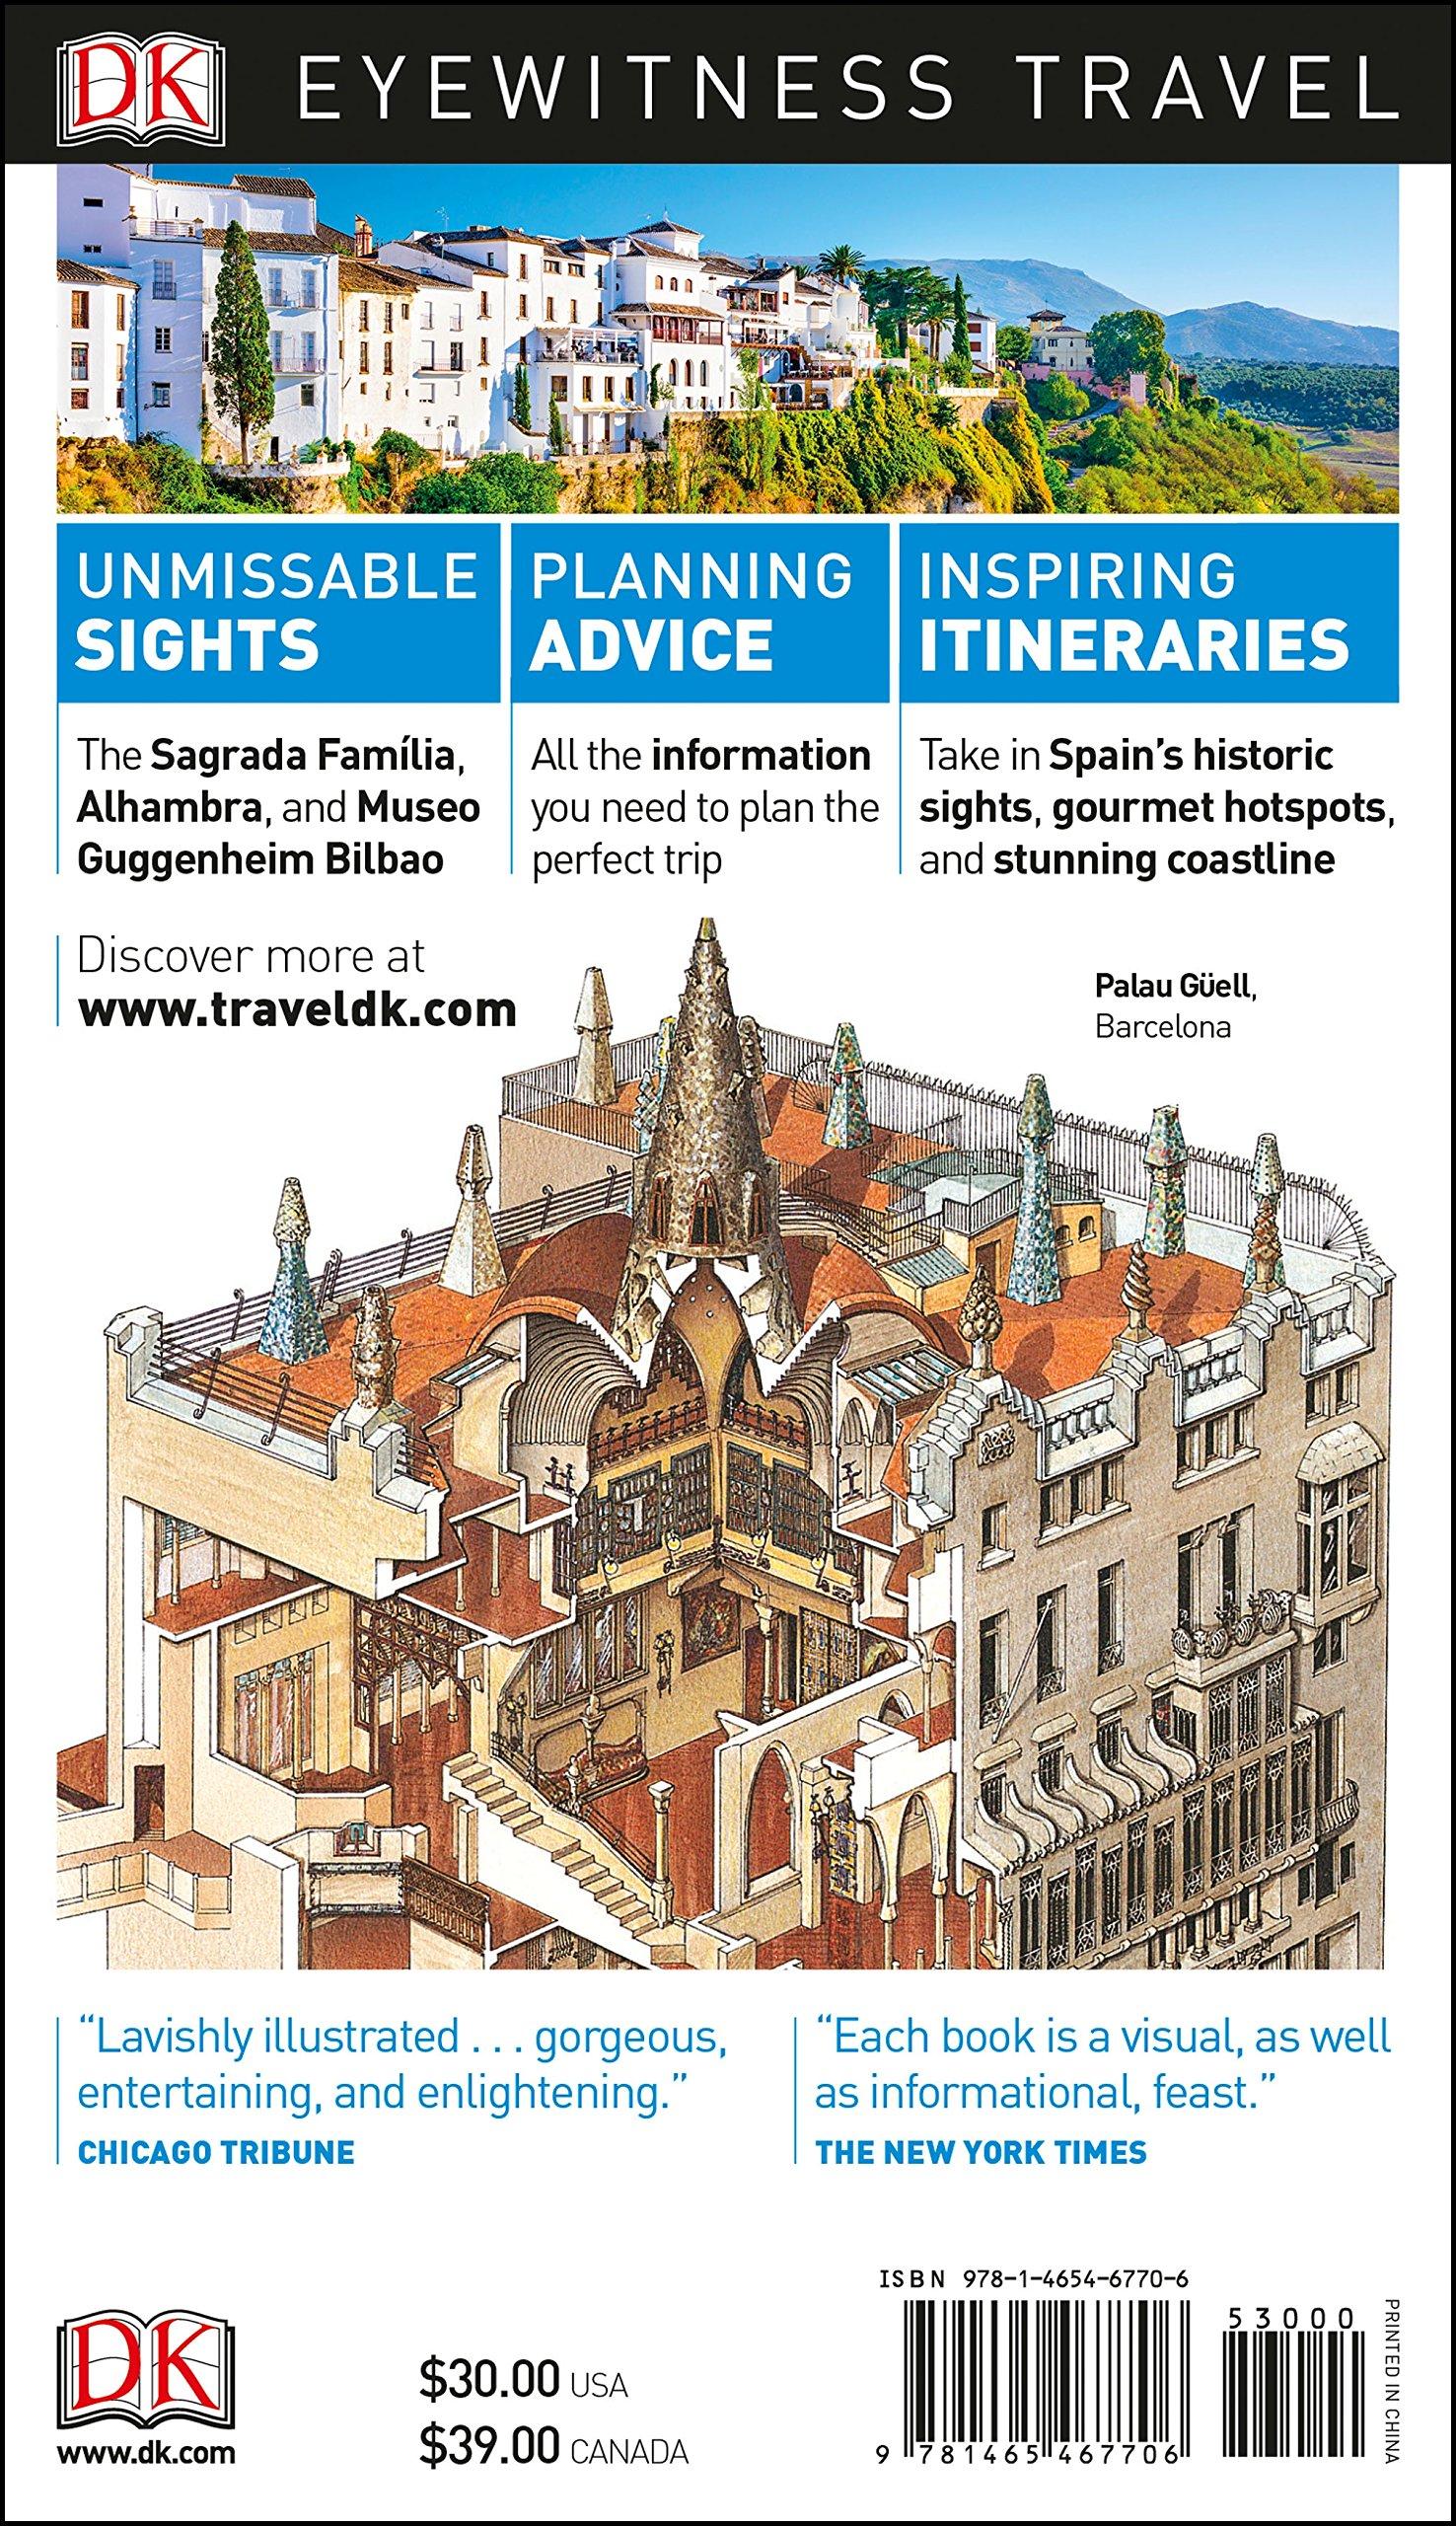 DK Eyewitness Travel Guide Spain: DK Travel: 9781465467706: Amazon.com: Books